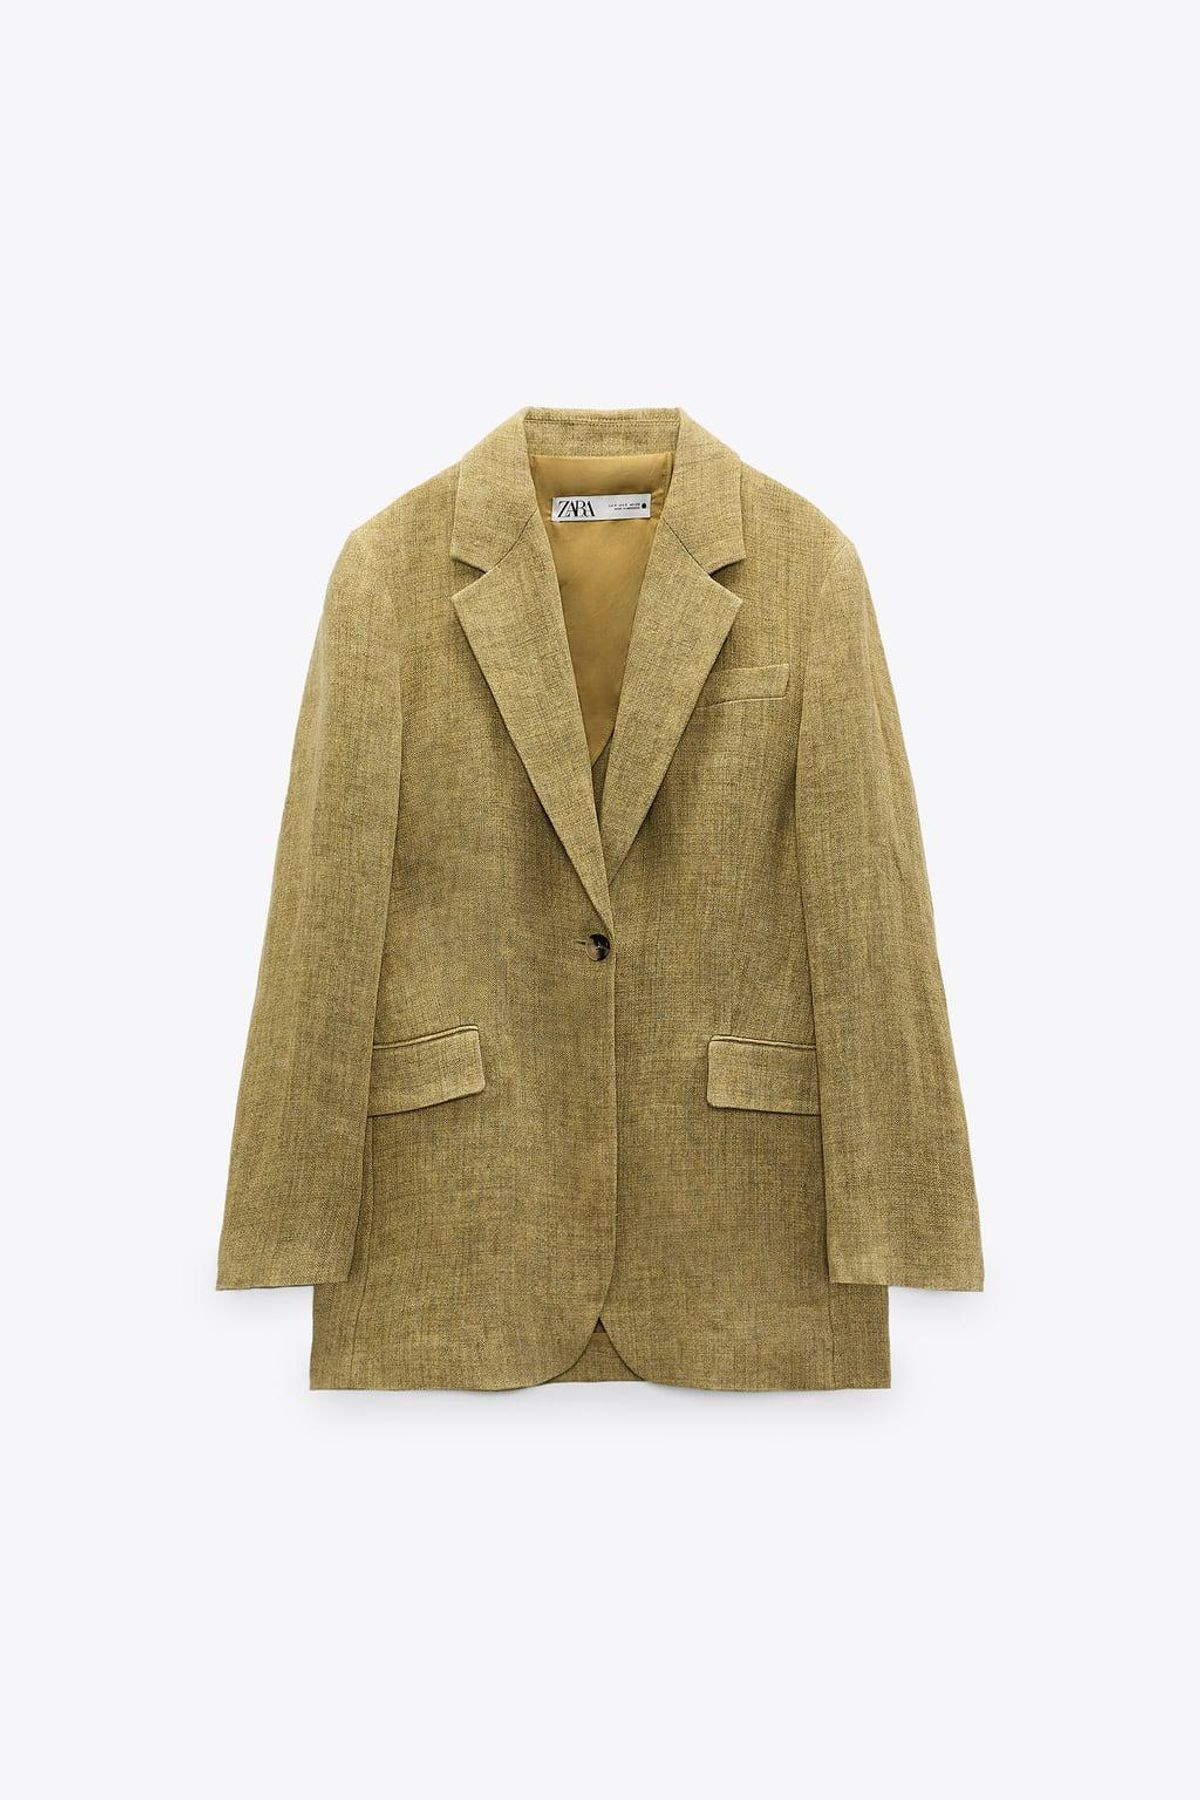 Oversized Linen Blazer Limited Edition